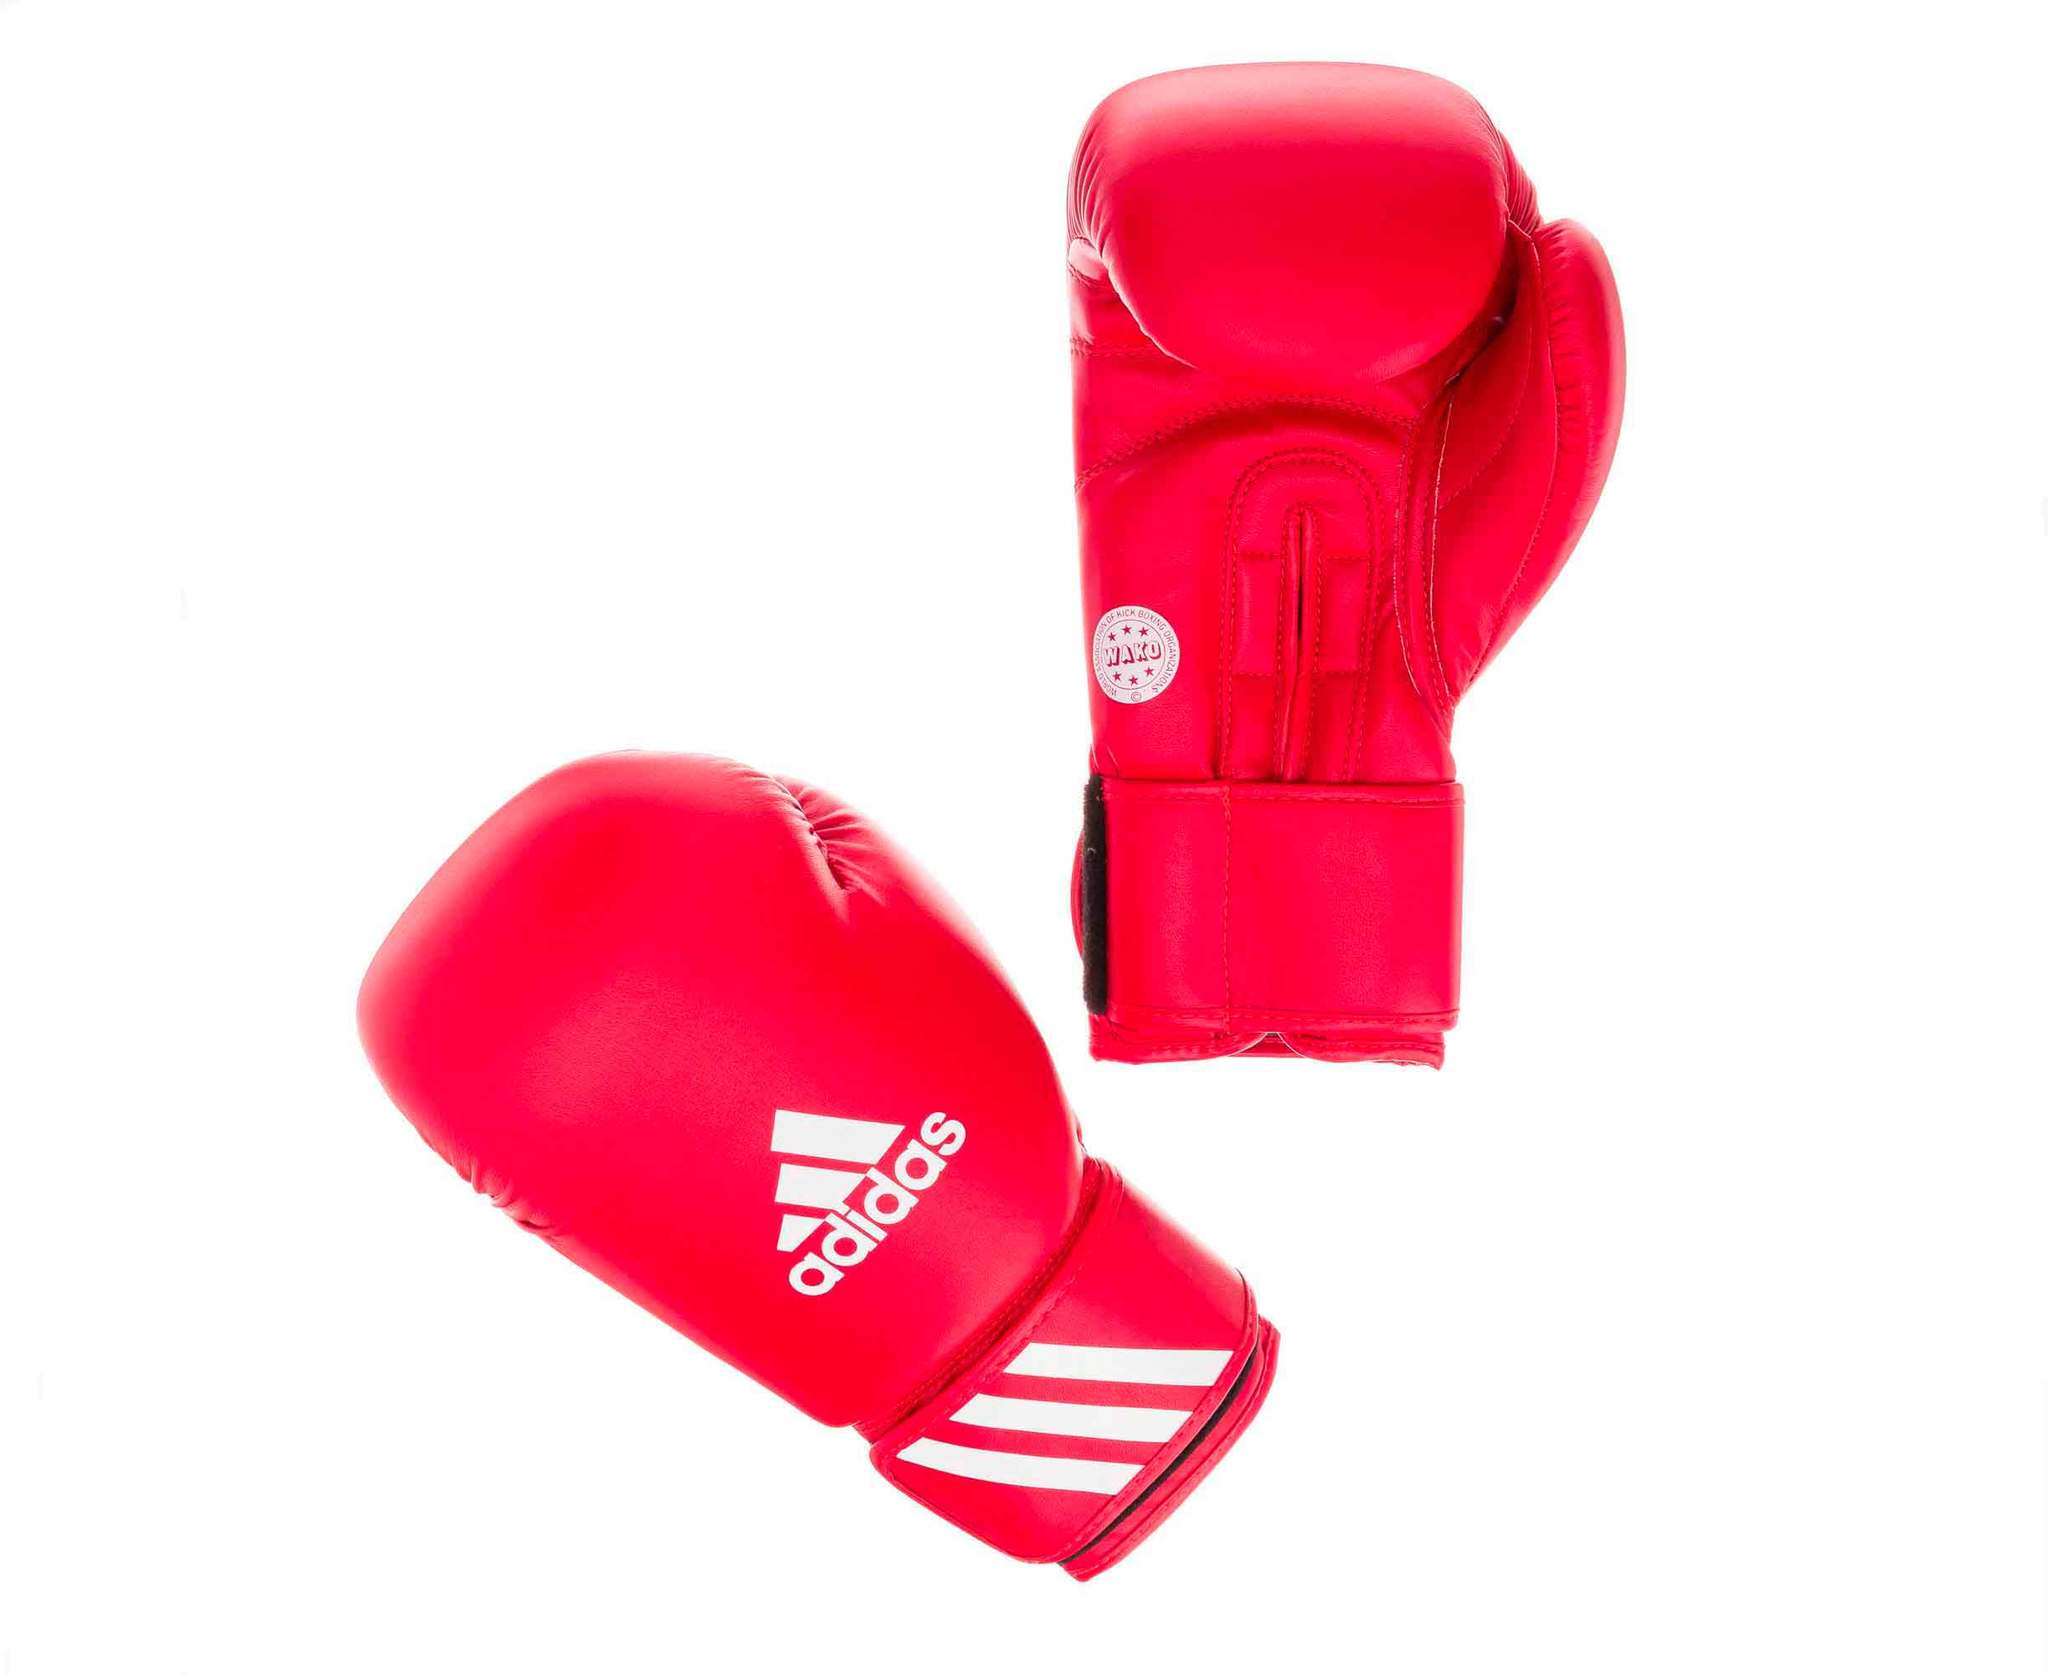 Перчатки ПЕРЧАТКИ ДЛЯ КИКБОКСИНГА WAKO TRAINING GLOVE perchatki_dlya_kikboksinga_wako_kickboxing_training_glove_krasnye.jpg